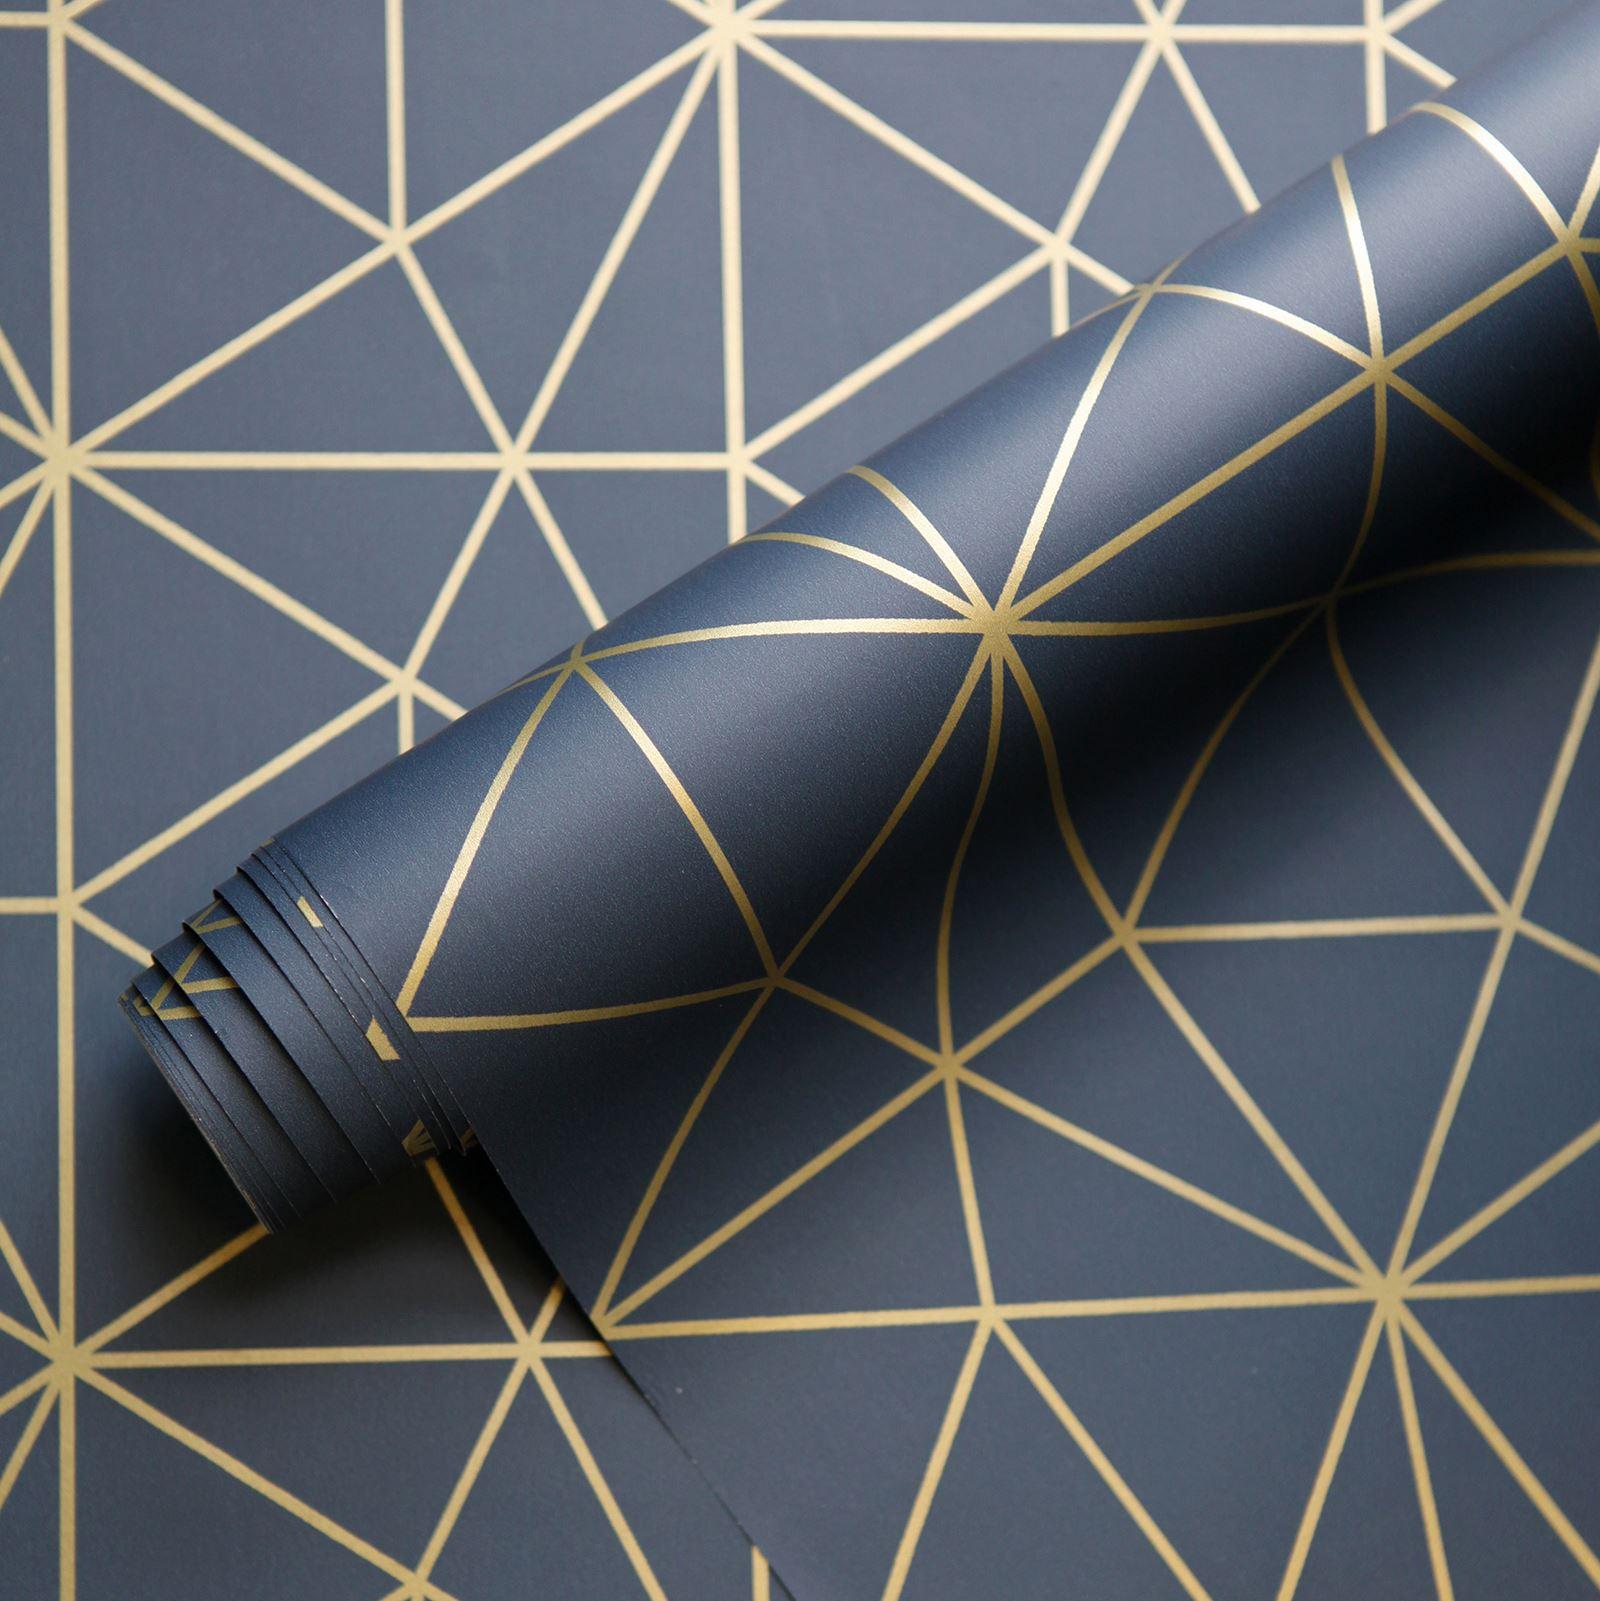 miniatura 138 - Carta da Parati Geometrica Arredamento Camera Moderno Vari Disegni e Colori